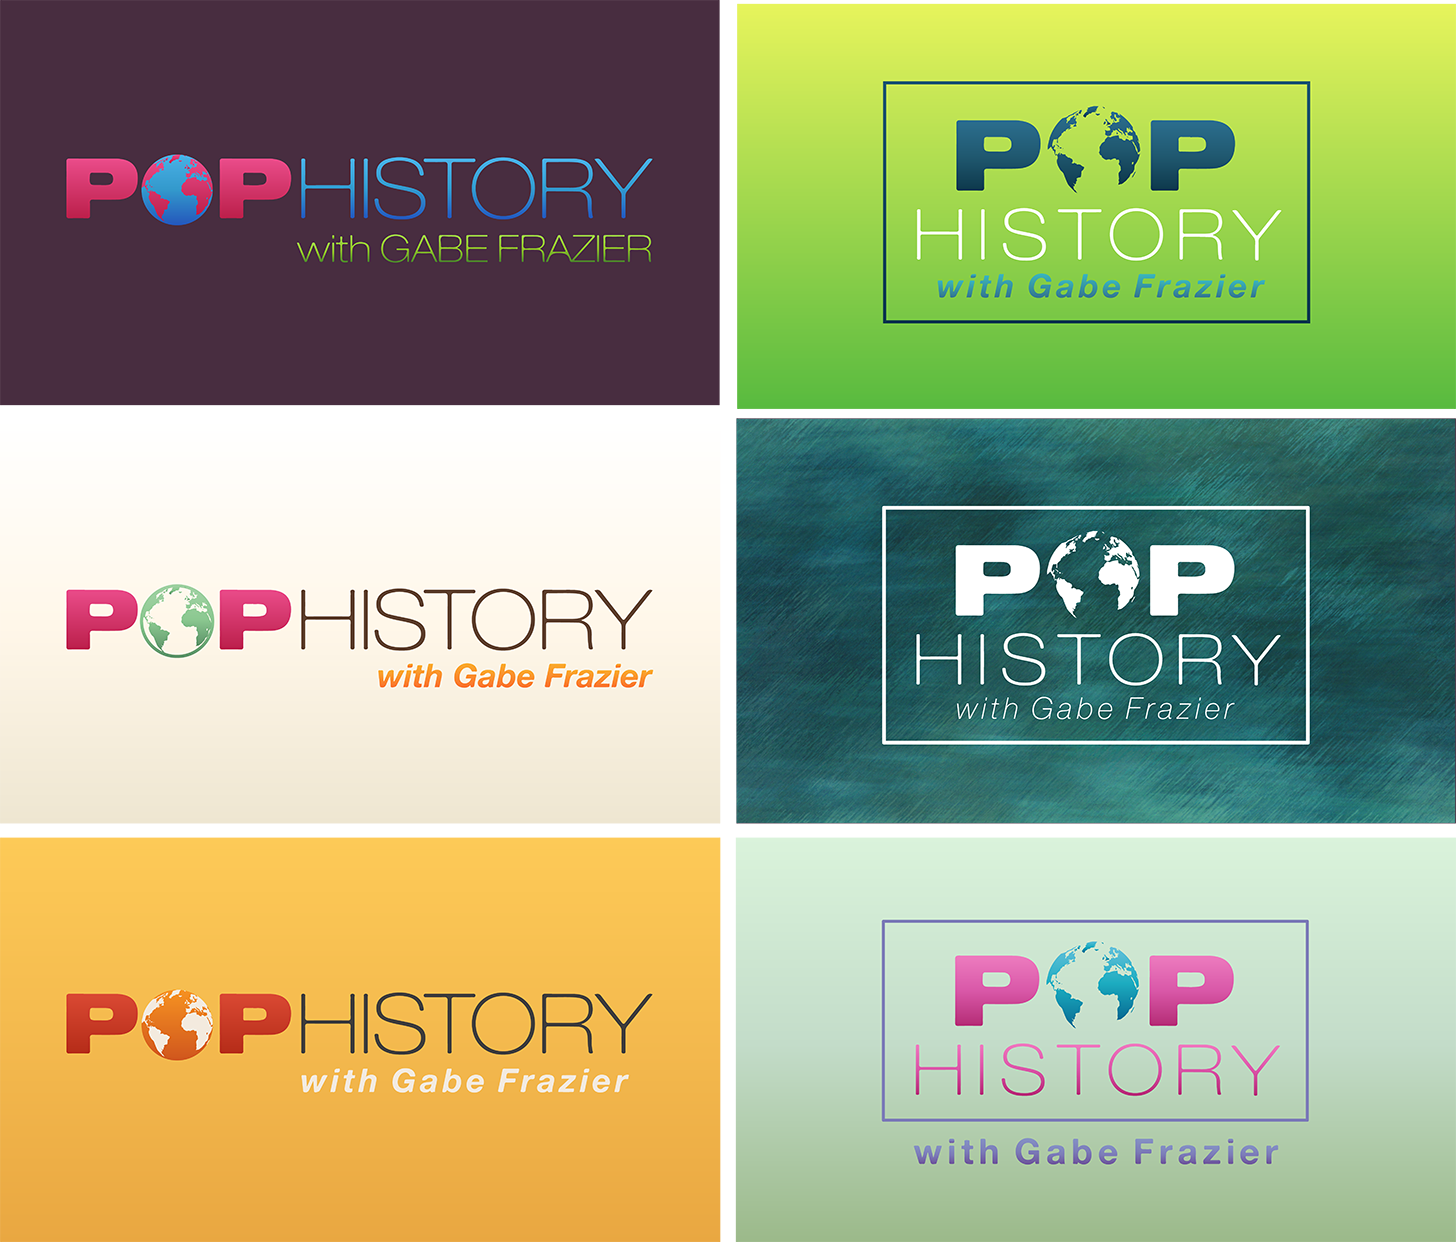 pophistory ideas-02sm.png